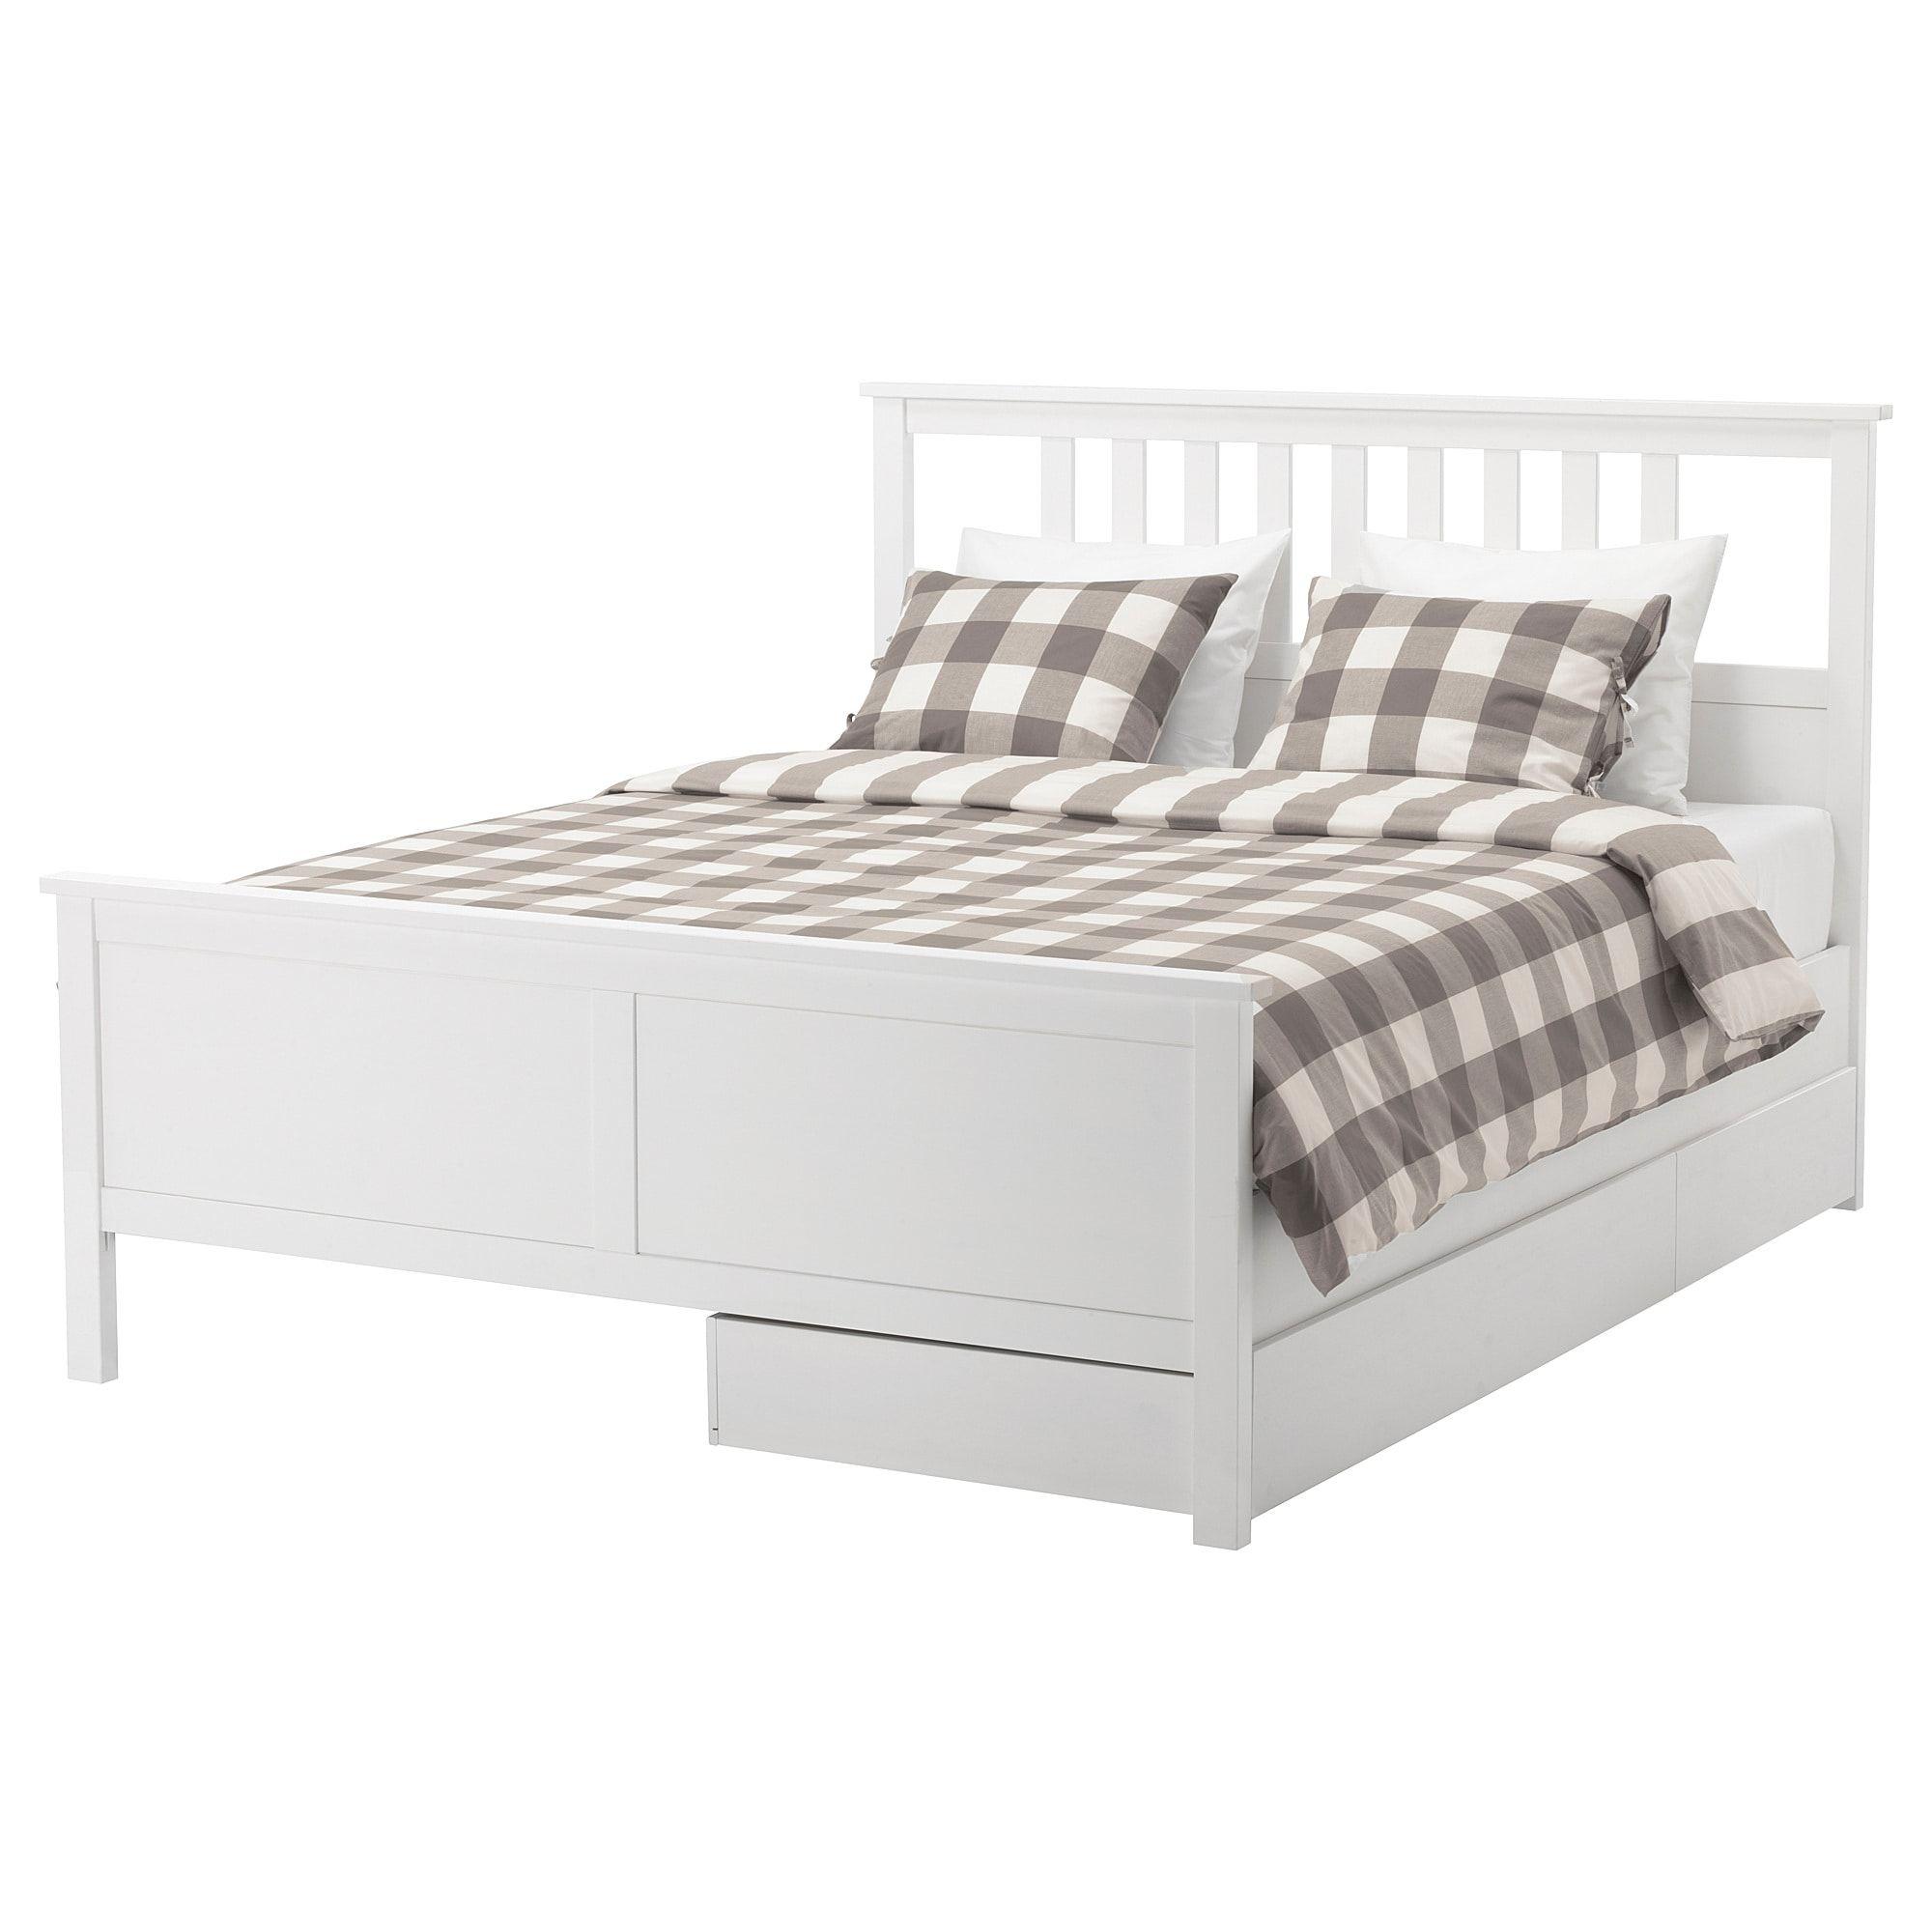 Hemnes Bed Frame With 2 Storage Boxes White Stain Leirsund